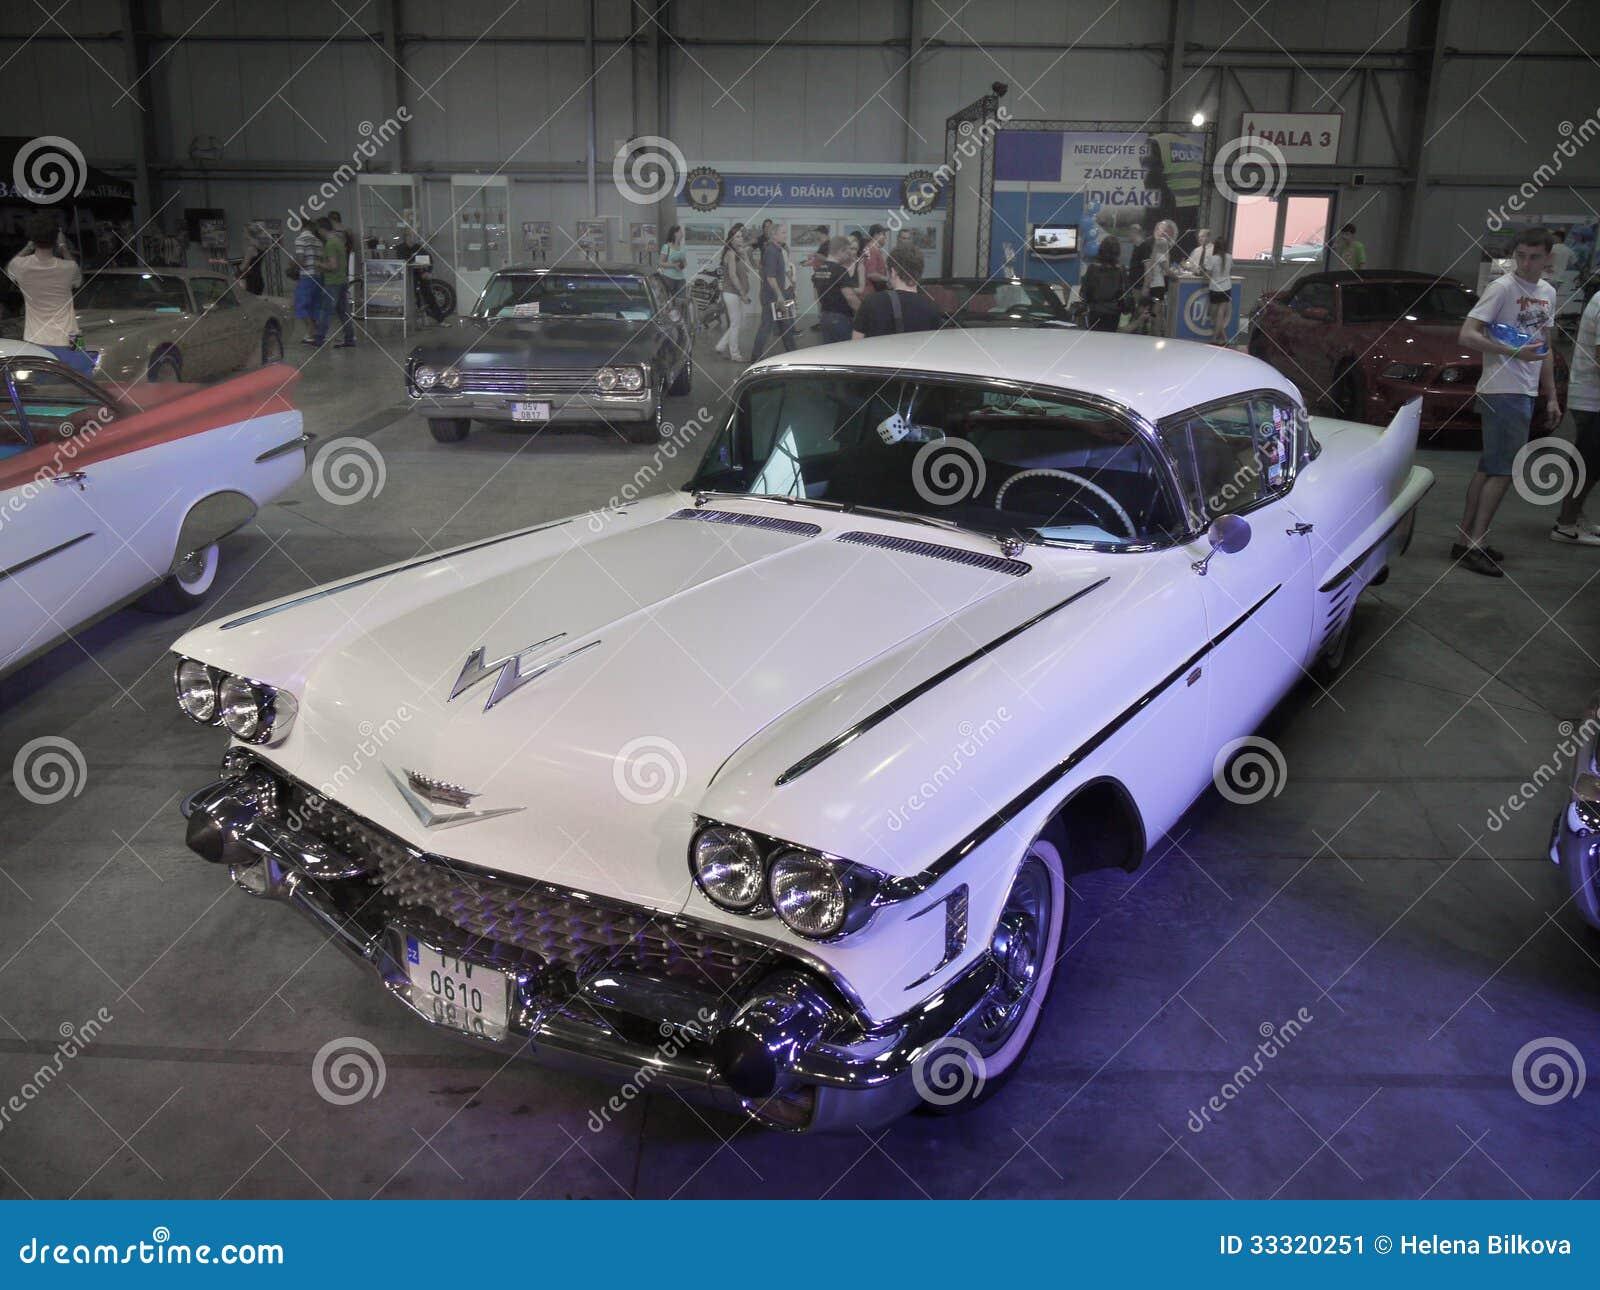 Luxury Vehicle: Car-Show Old Luxury Americas Cadillac Editorial Photo